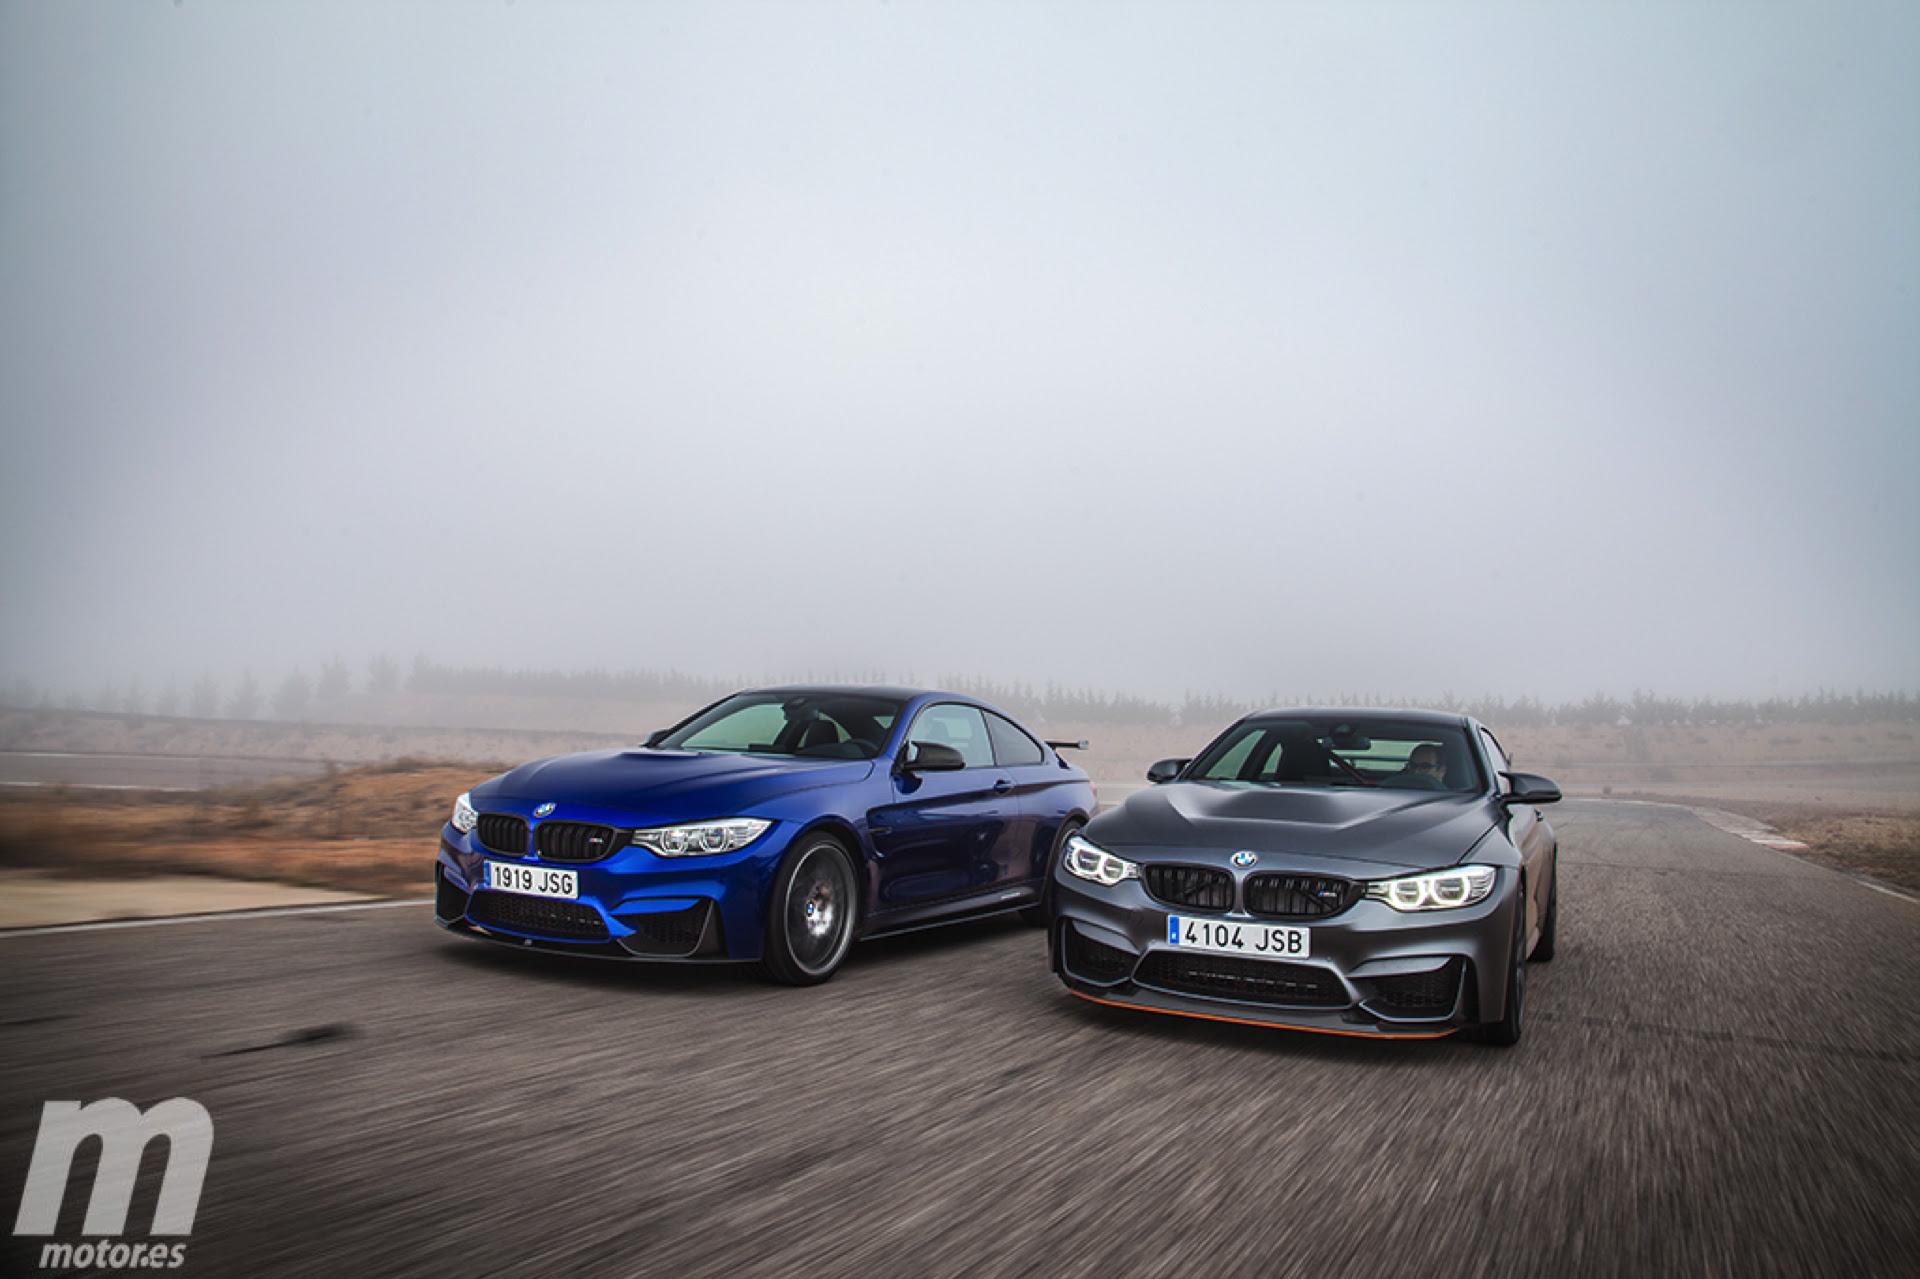 BMW-M4-GTS-BMW-M4-CS-21